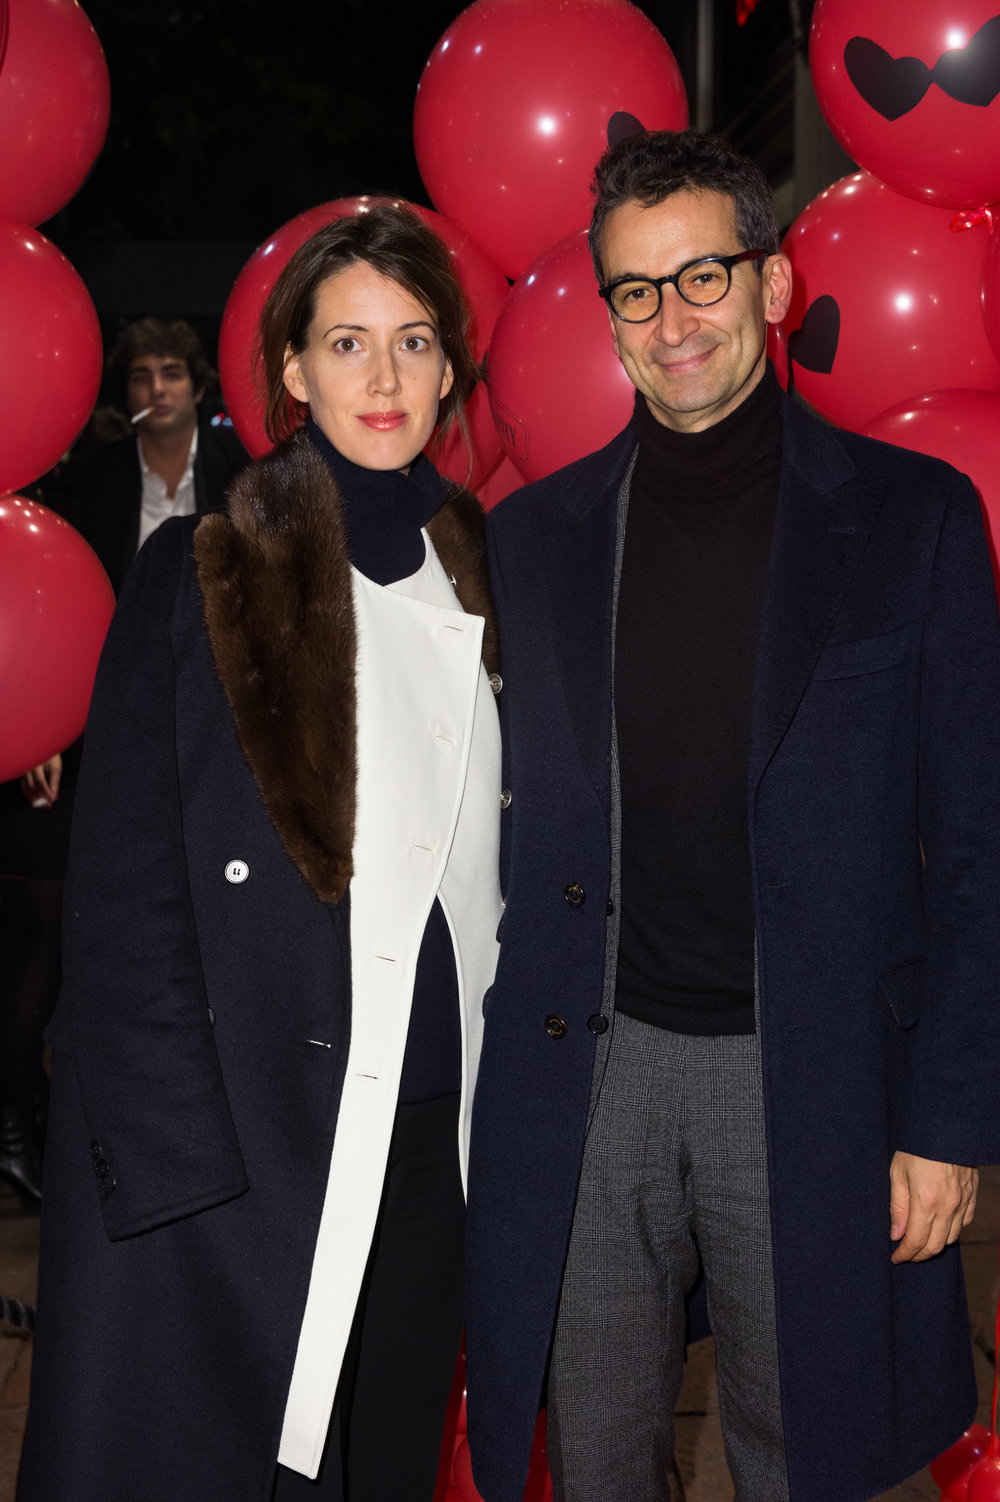 Kerry Olsen & Federico Marchetti